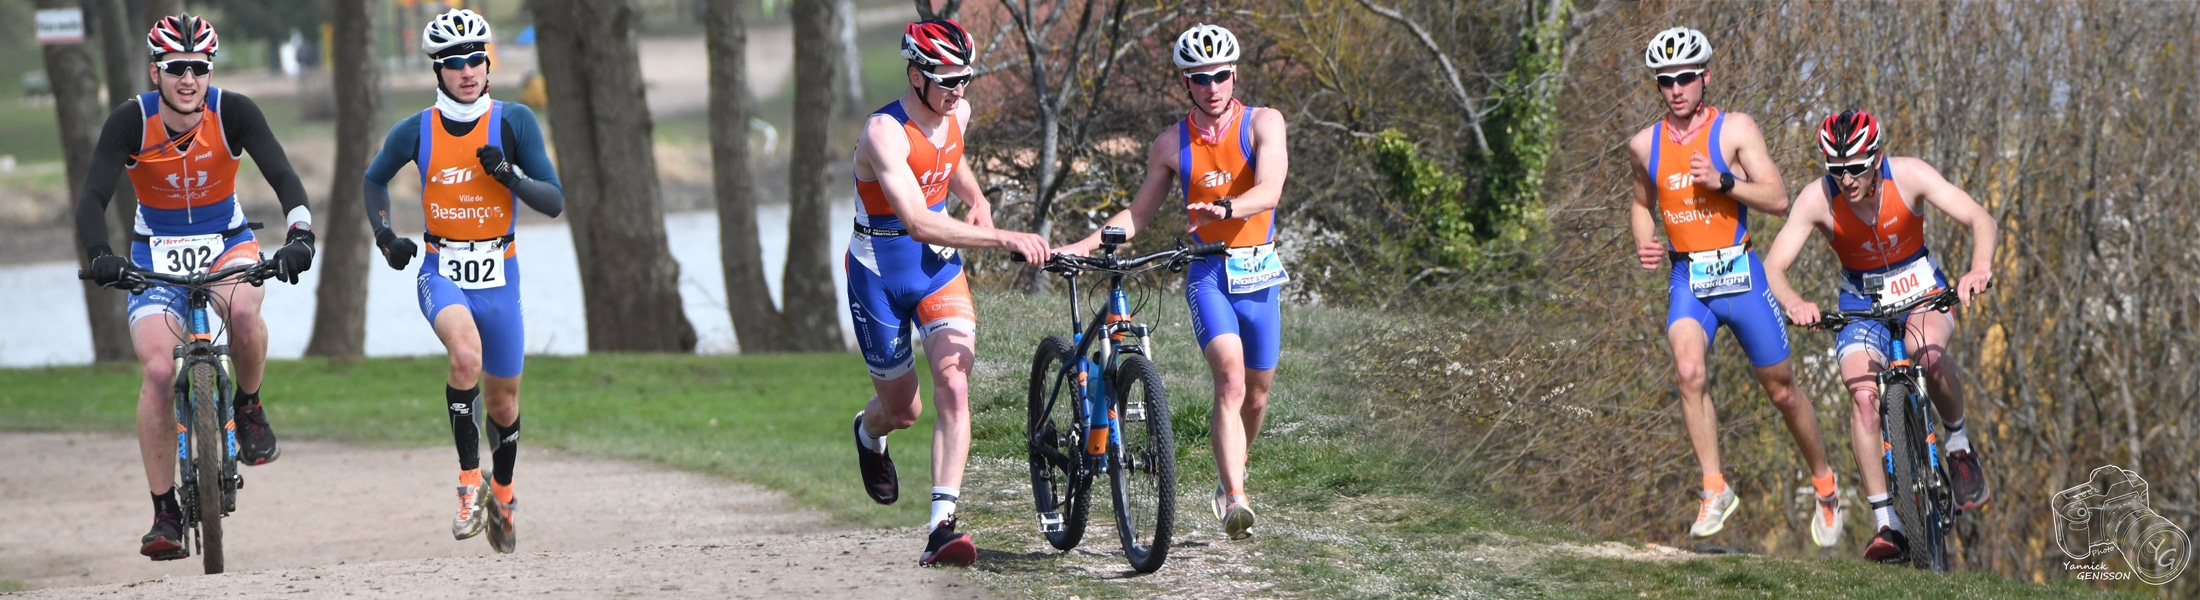 Bike Run Belfort Clément Esseiva et Robin Génisson